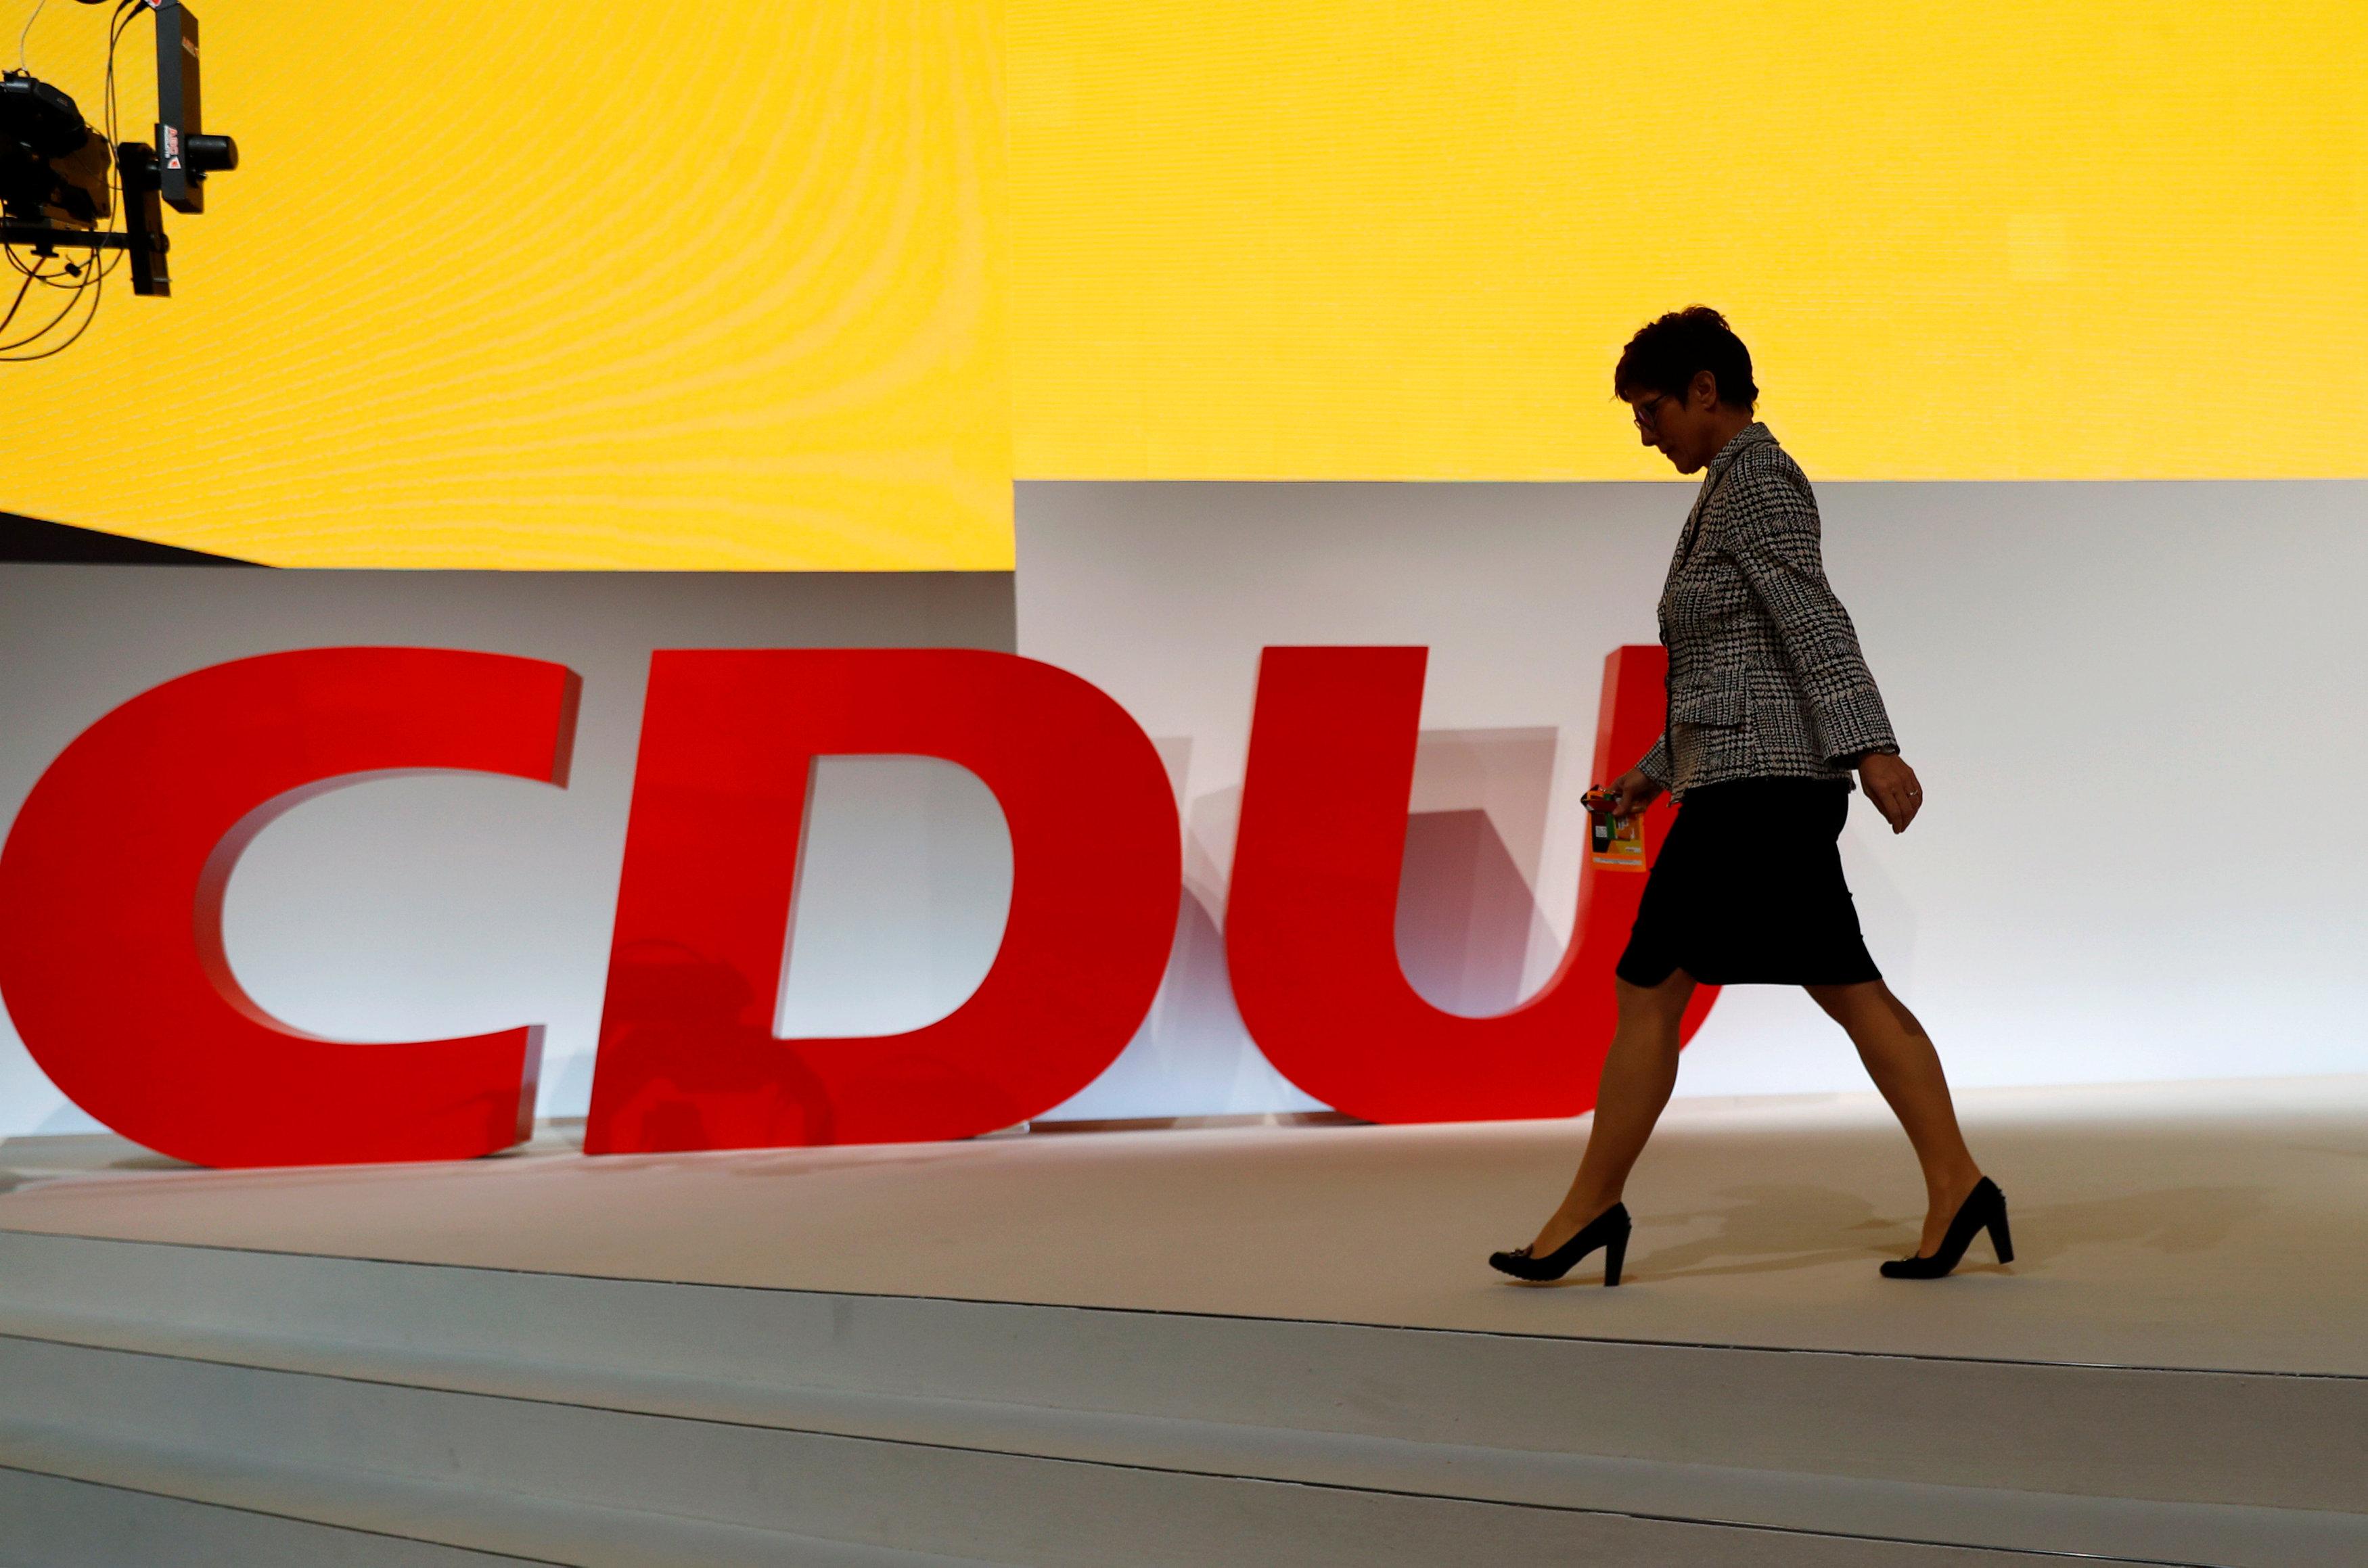 2018 12 07T092123Z 573772091 RC1E90527130 RTRMADP 3 GERMANY POLITICS CDU